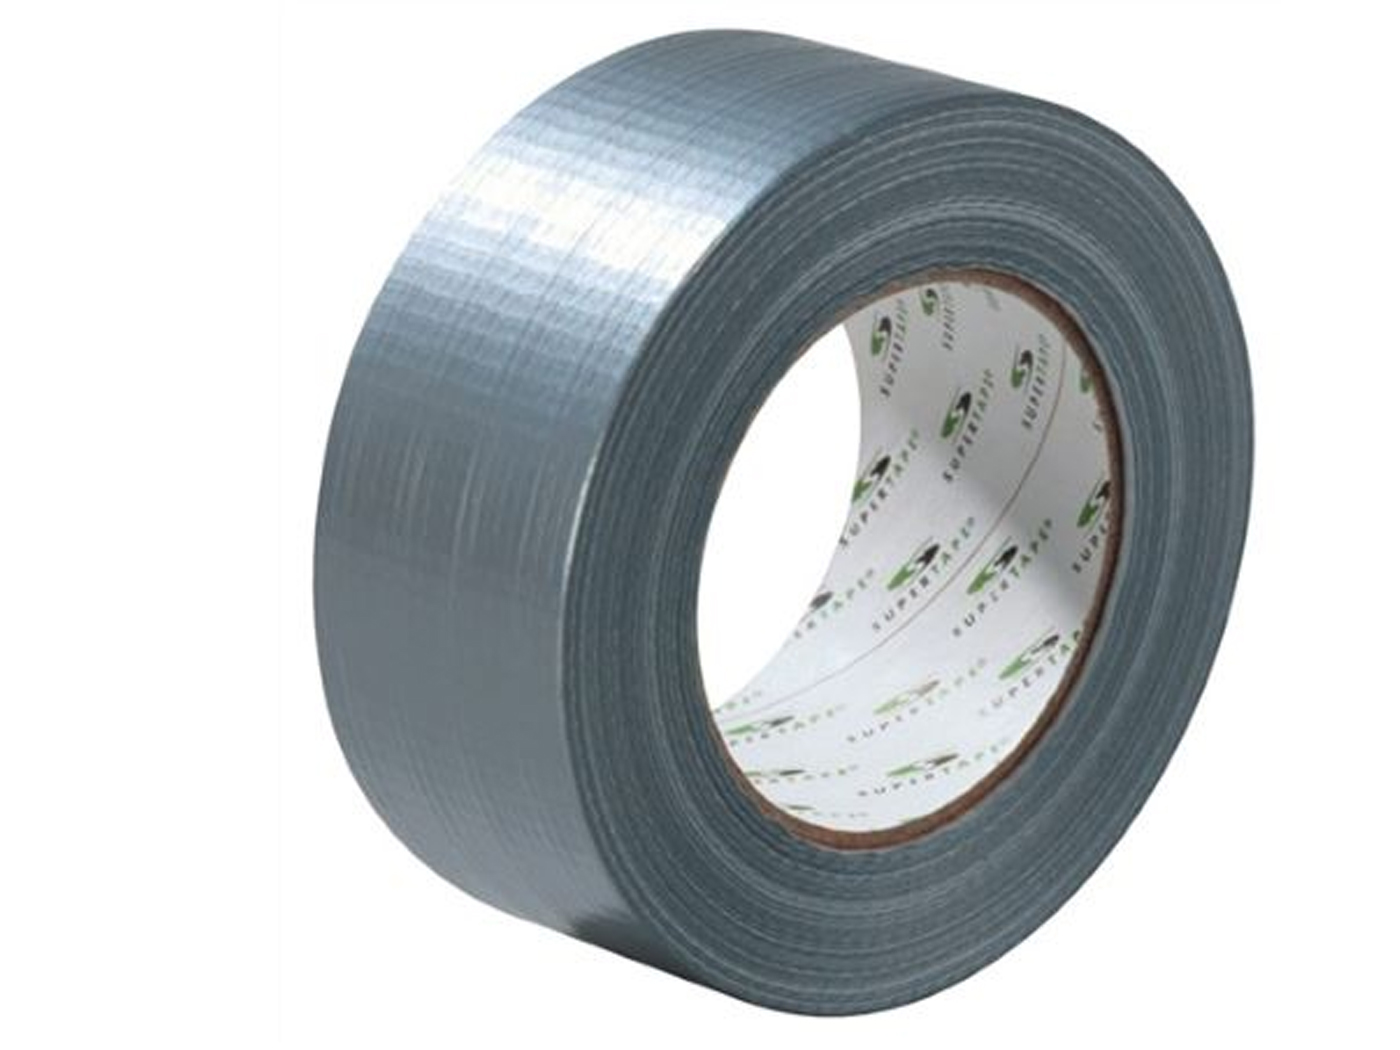 Plakband Superduct ST311 zilver   DKMTools - DKM Tools